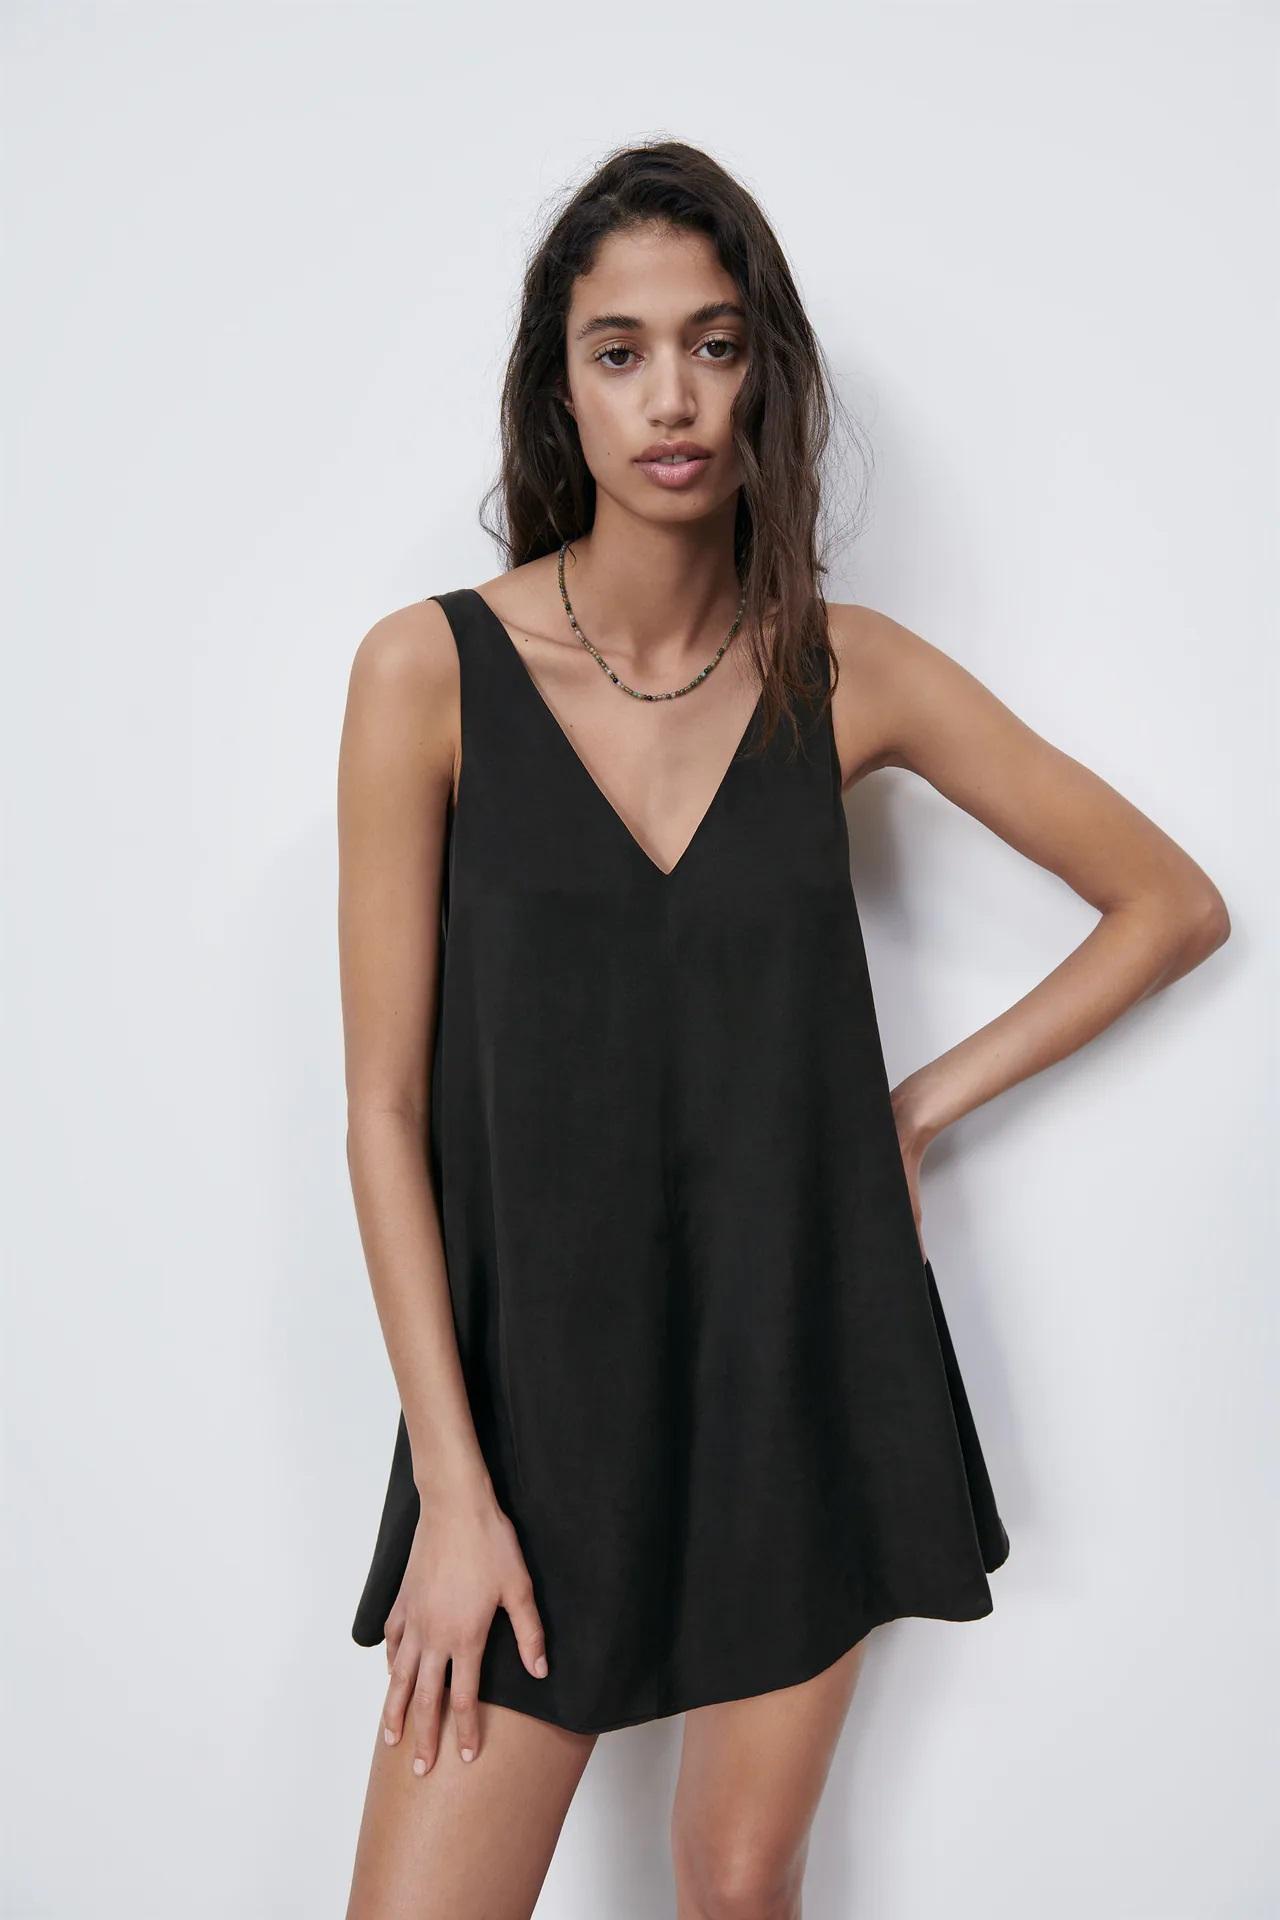 Amelia Bono combina mini vestido negro con botas militares